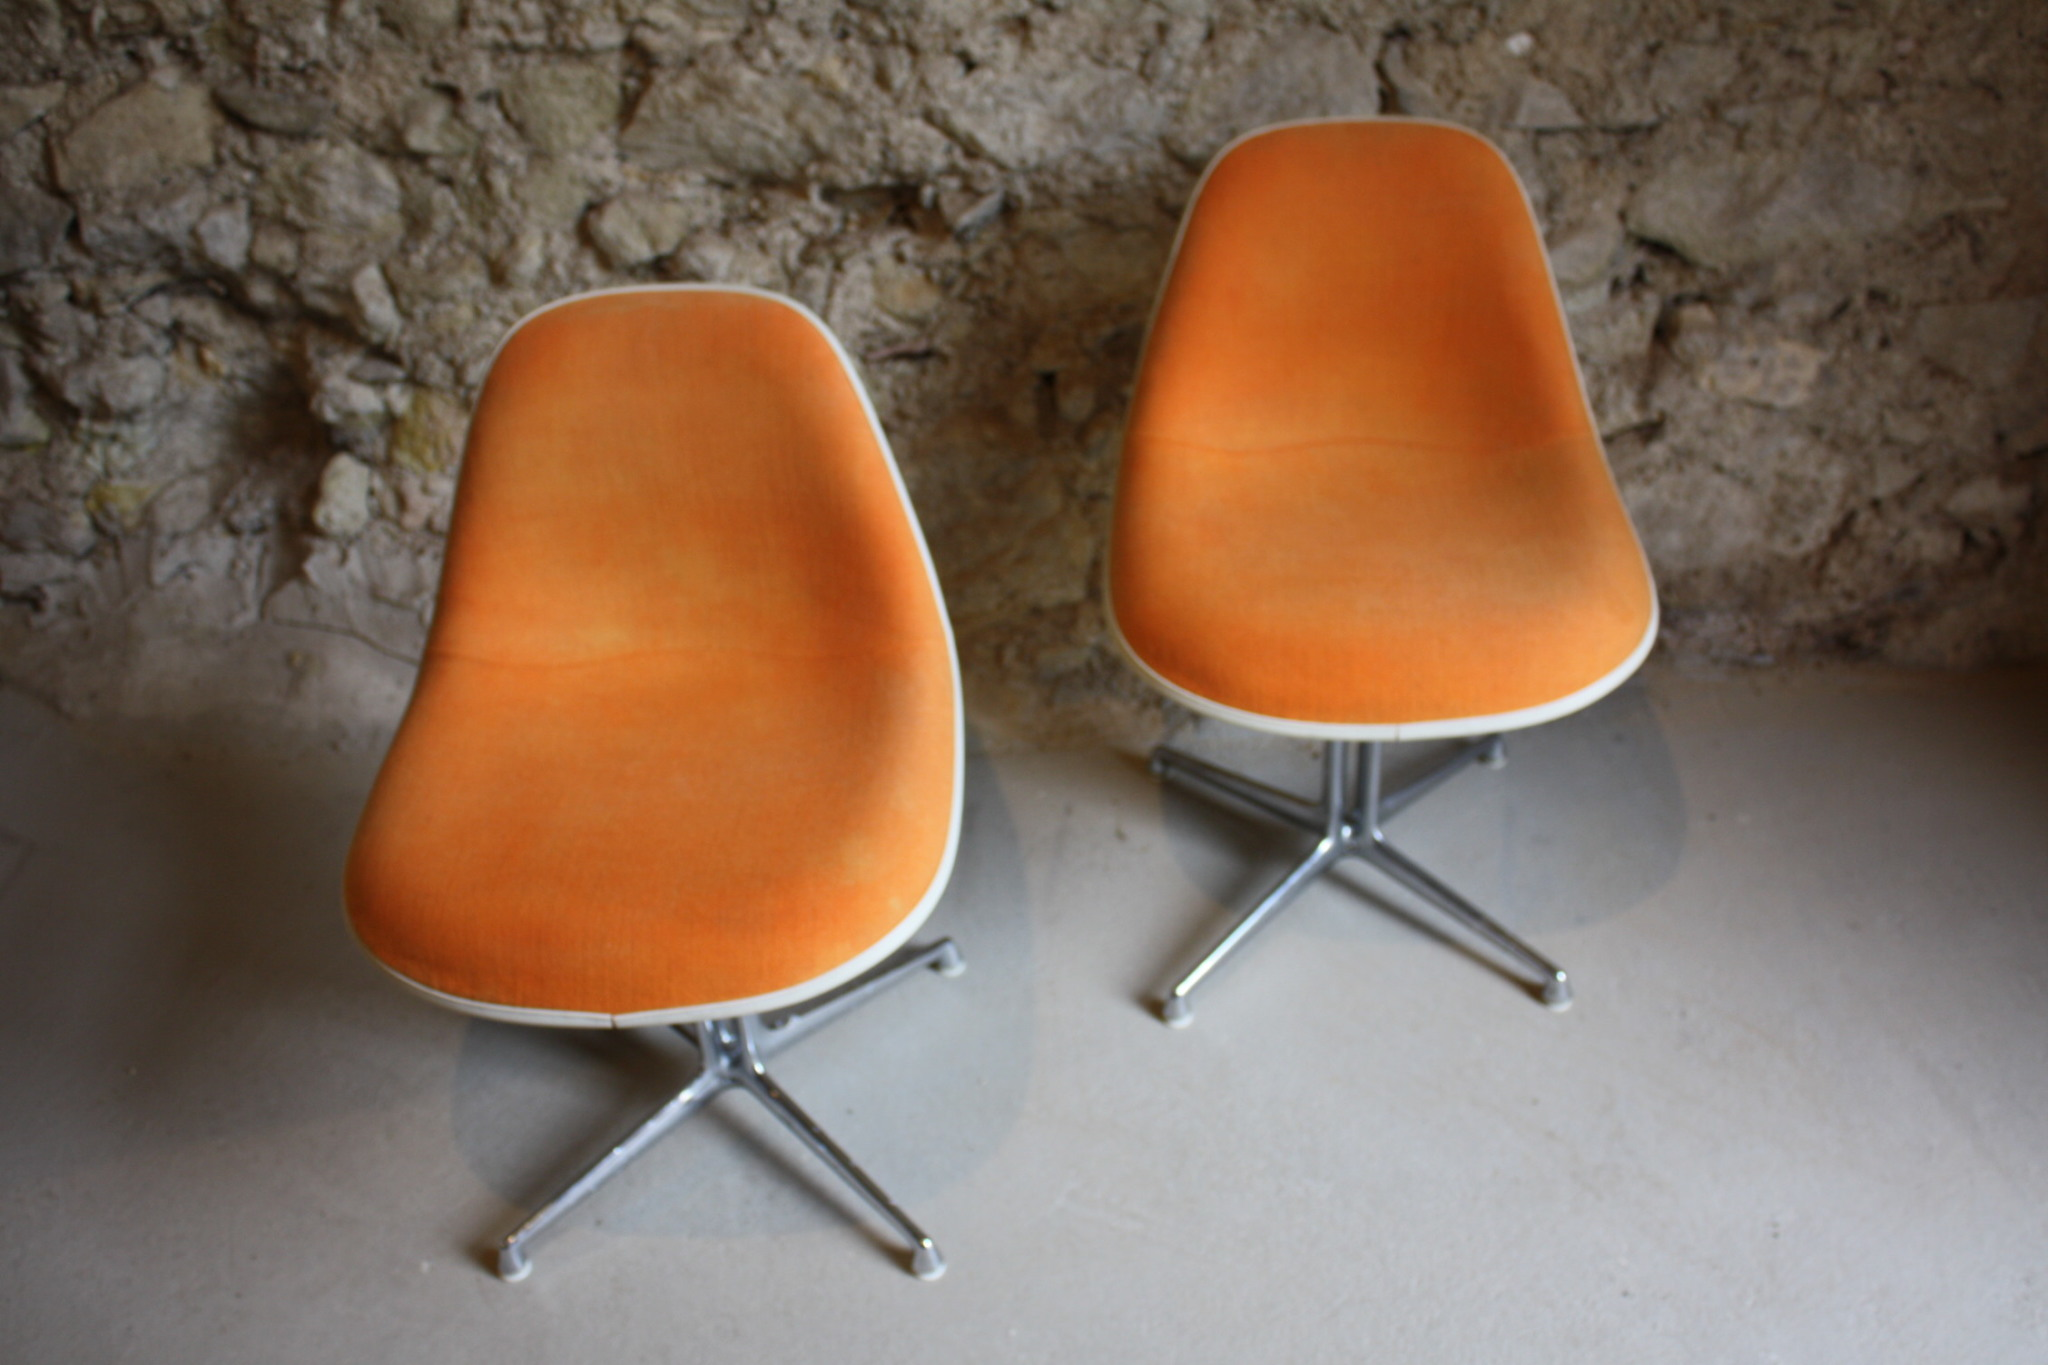 Eames lounge chair vitra vs herman miller vitra eames for Eames design stuhl